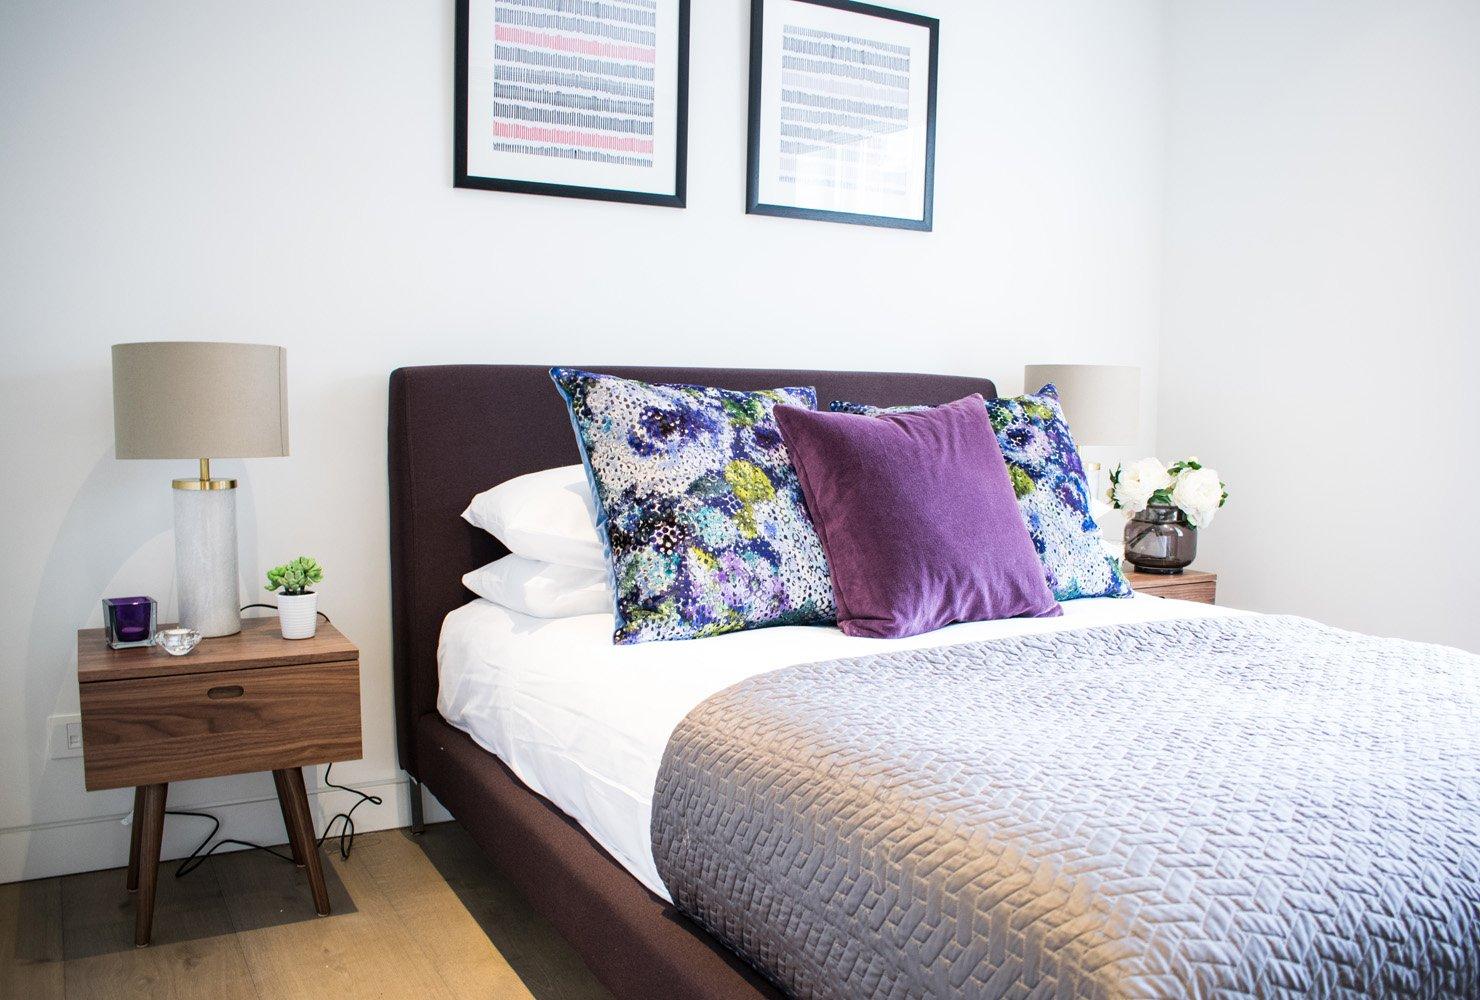 Marylebone-Luxury-Accommodation-Central-London-Serviced-Apartments-Near-Oxford-Street,-Bond-Street-&-Hyde-Park-Urban-Stay-7